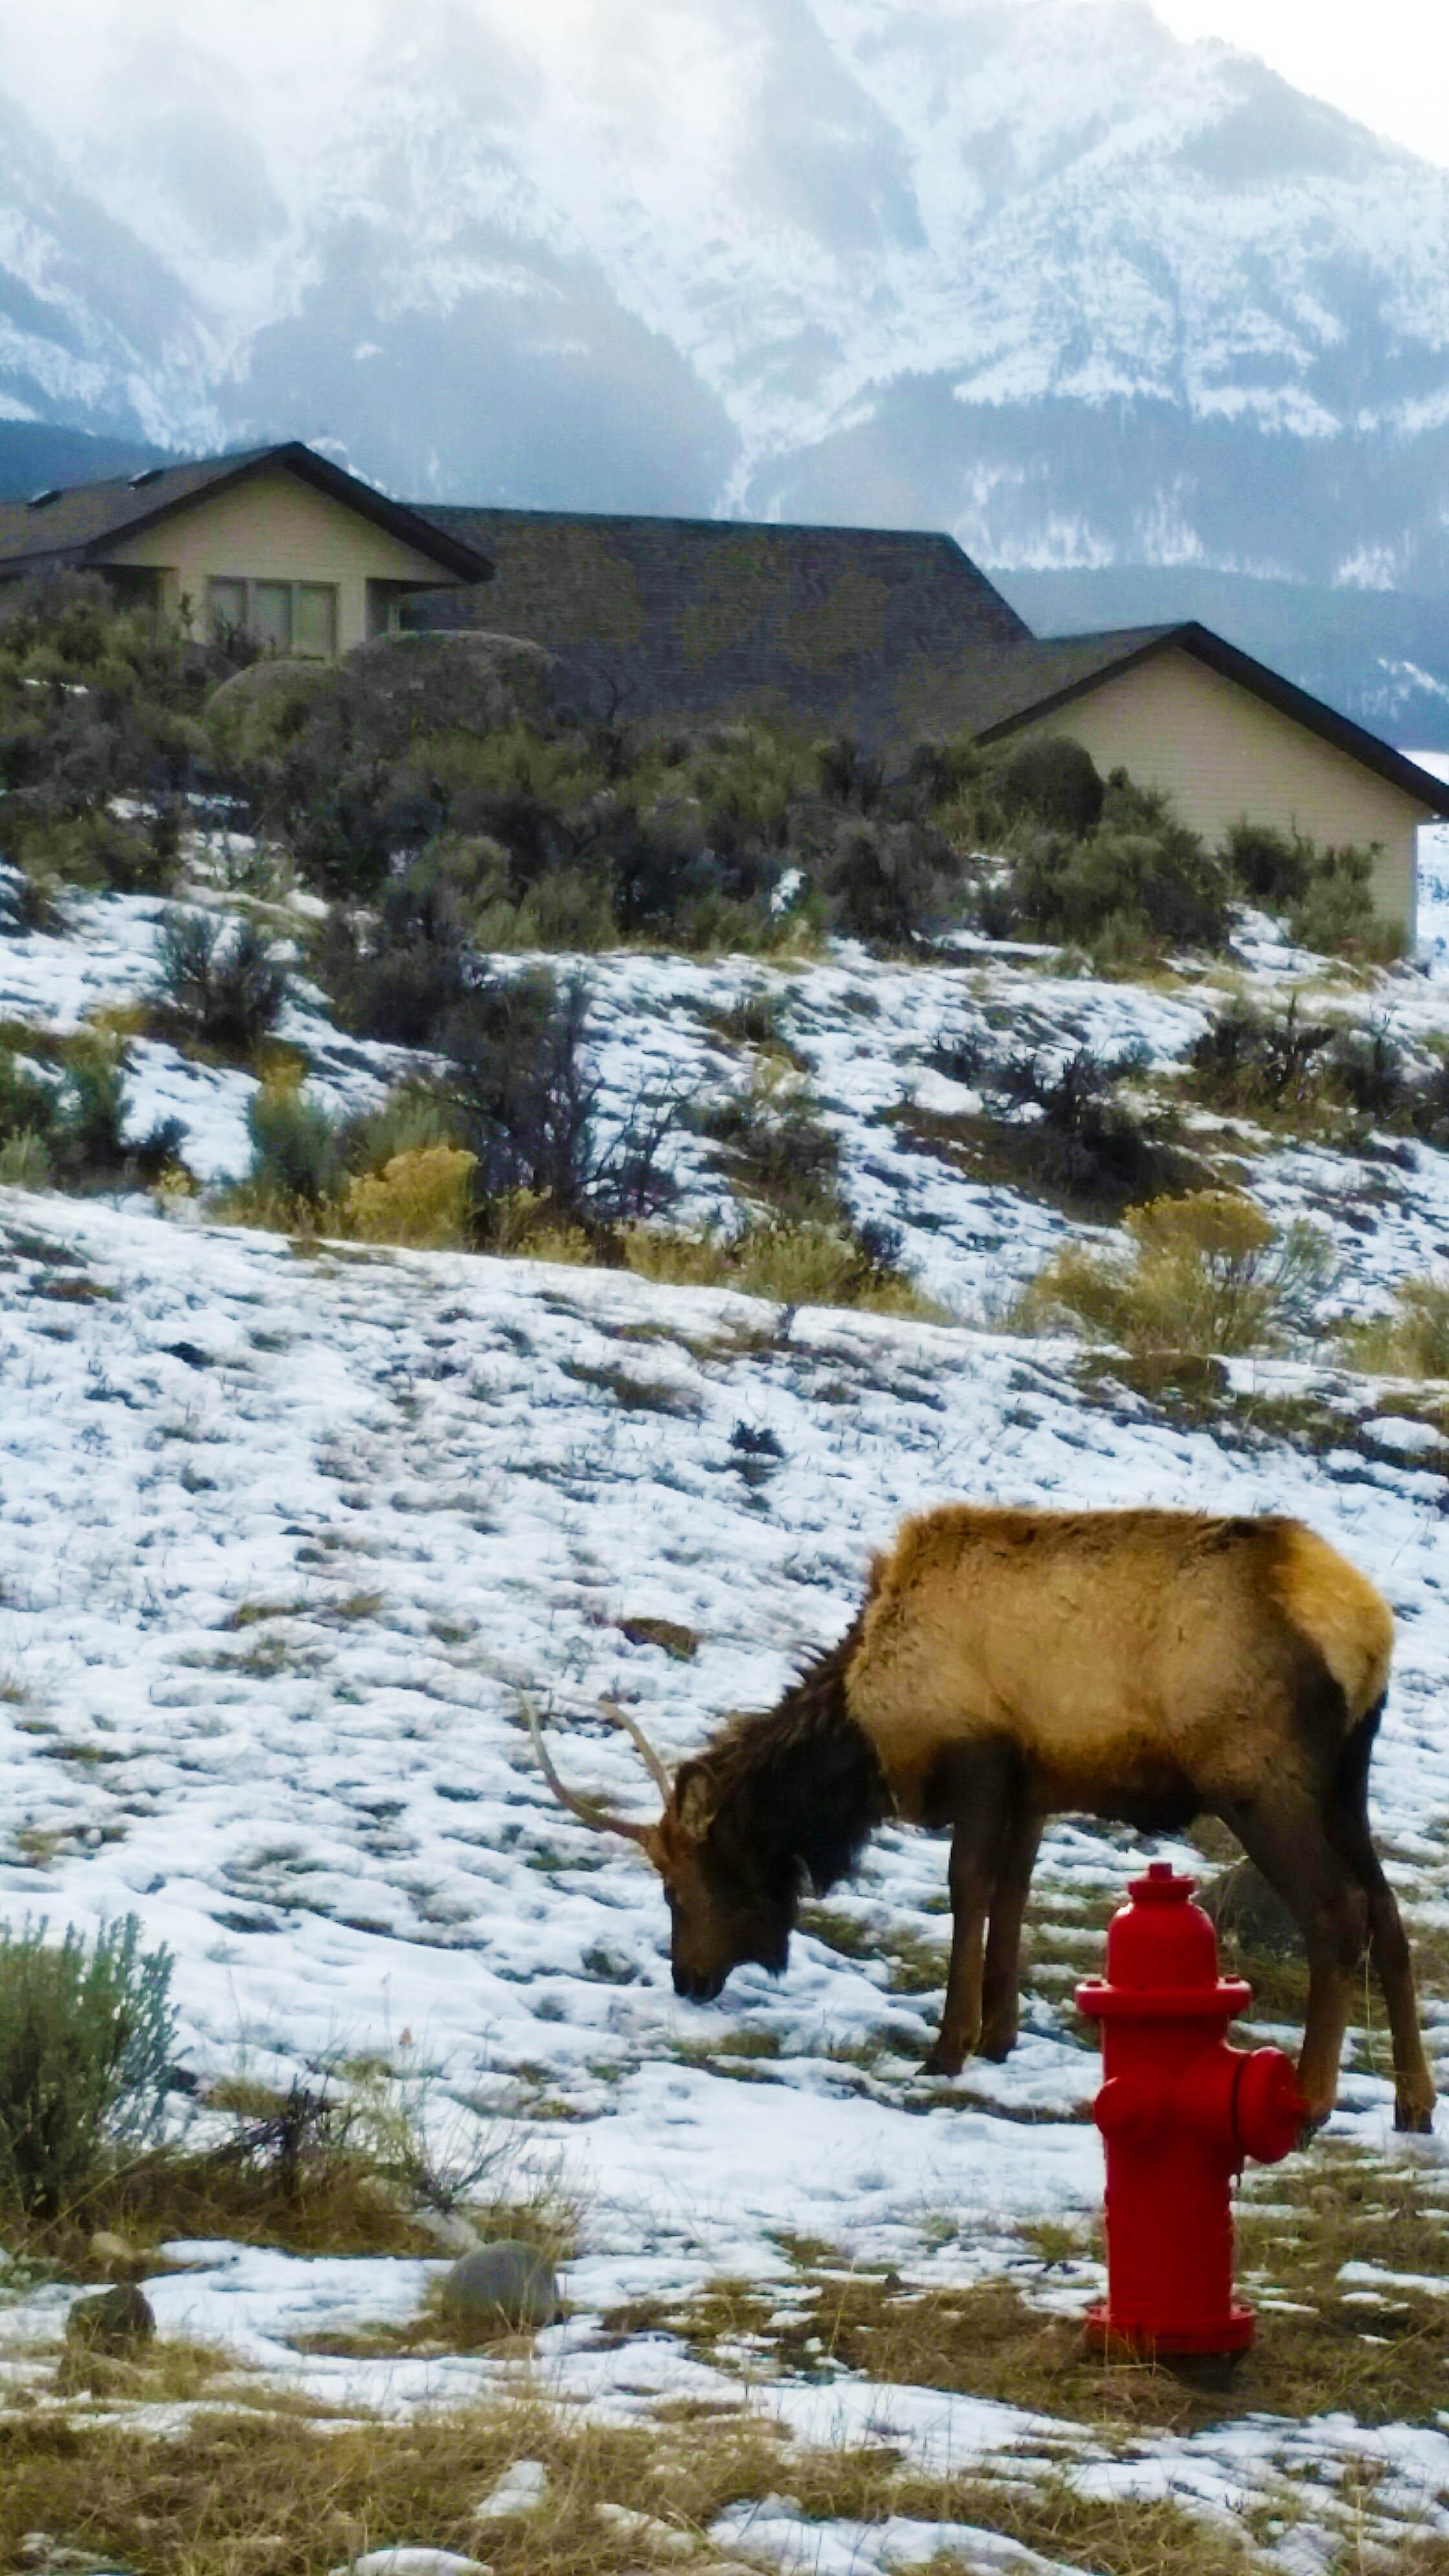 Elk in front of house